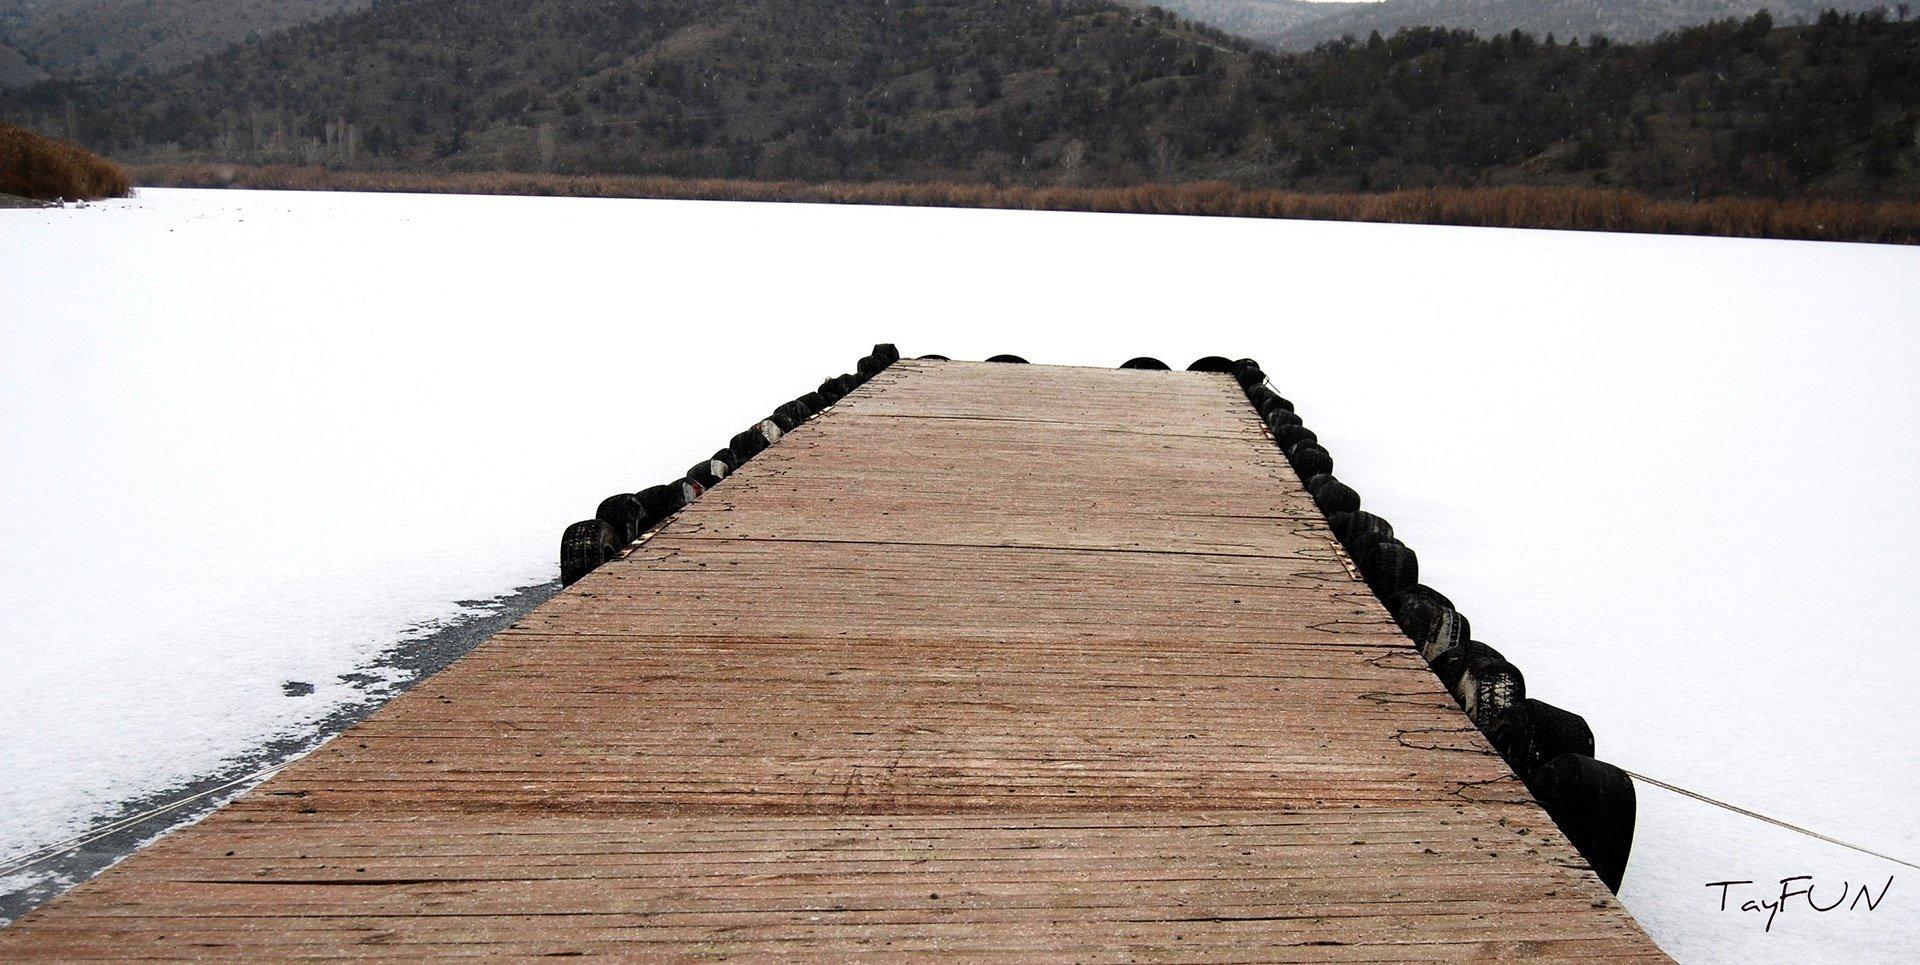 donmuş eymir gölü